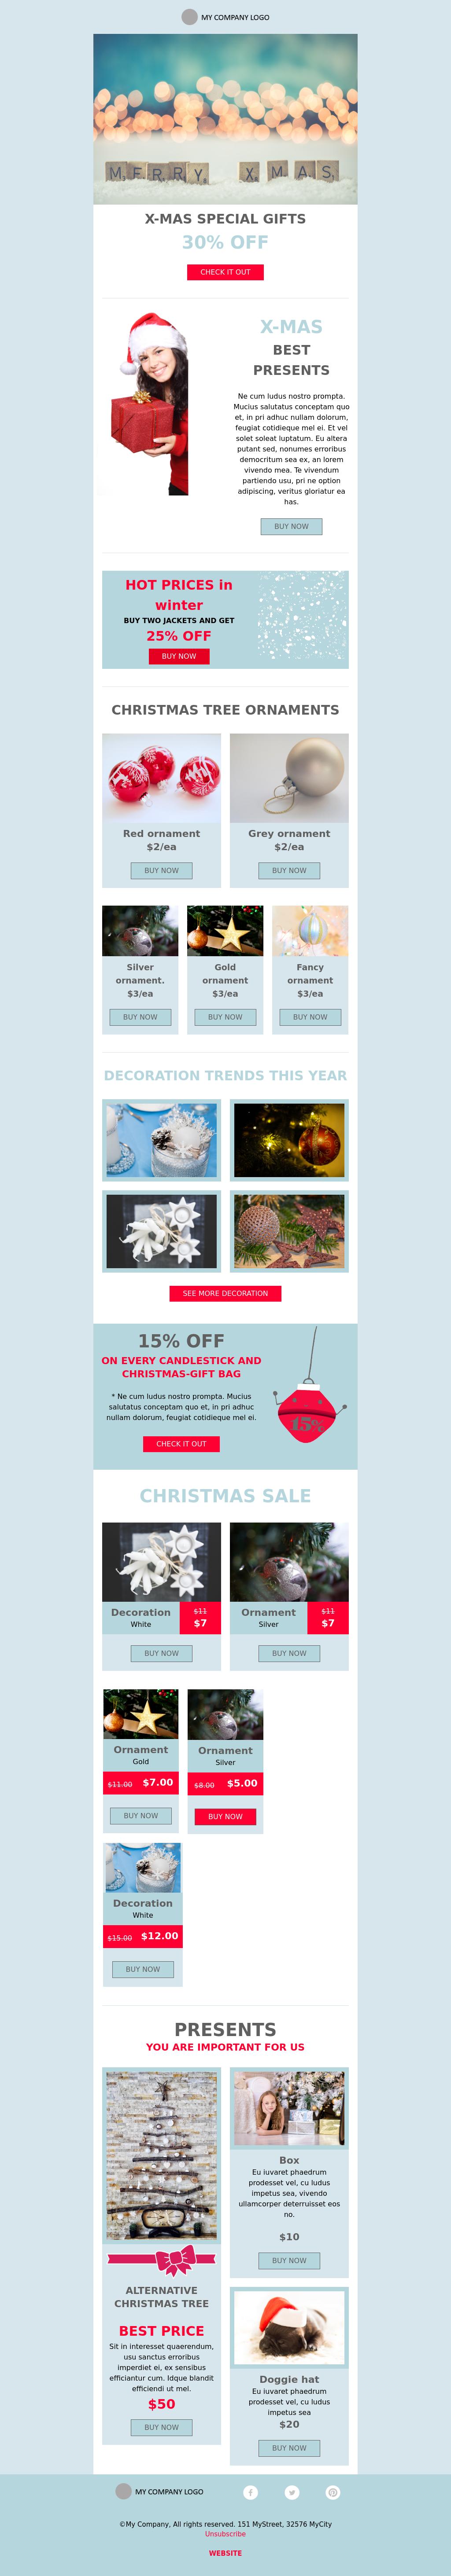 Light Blue Christmas Promotional Template